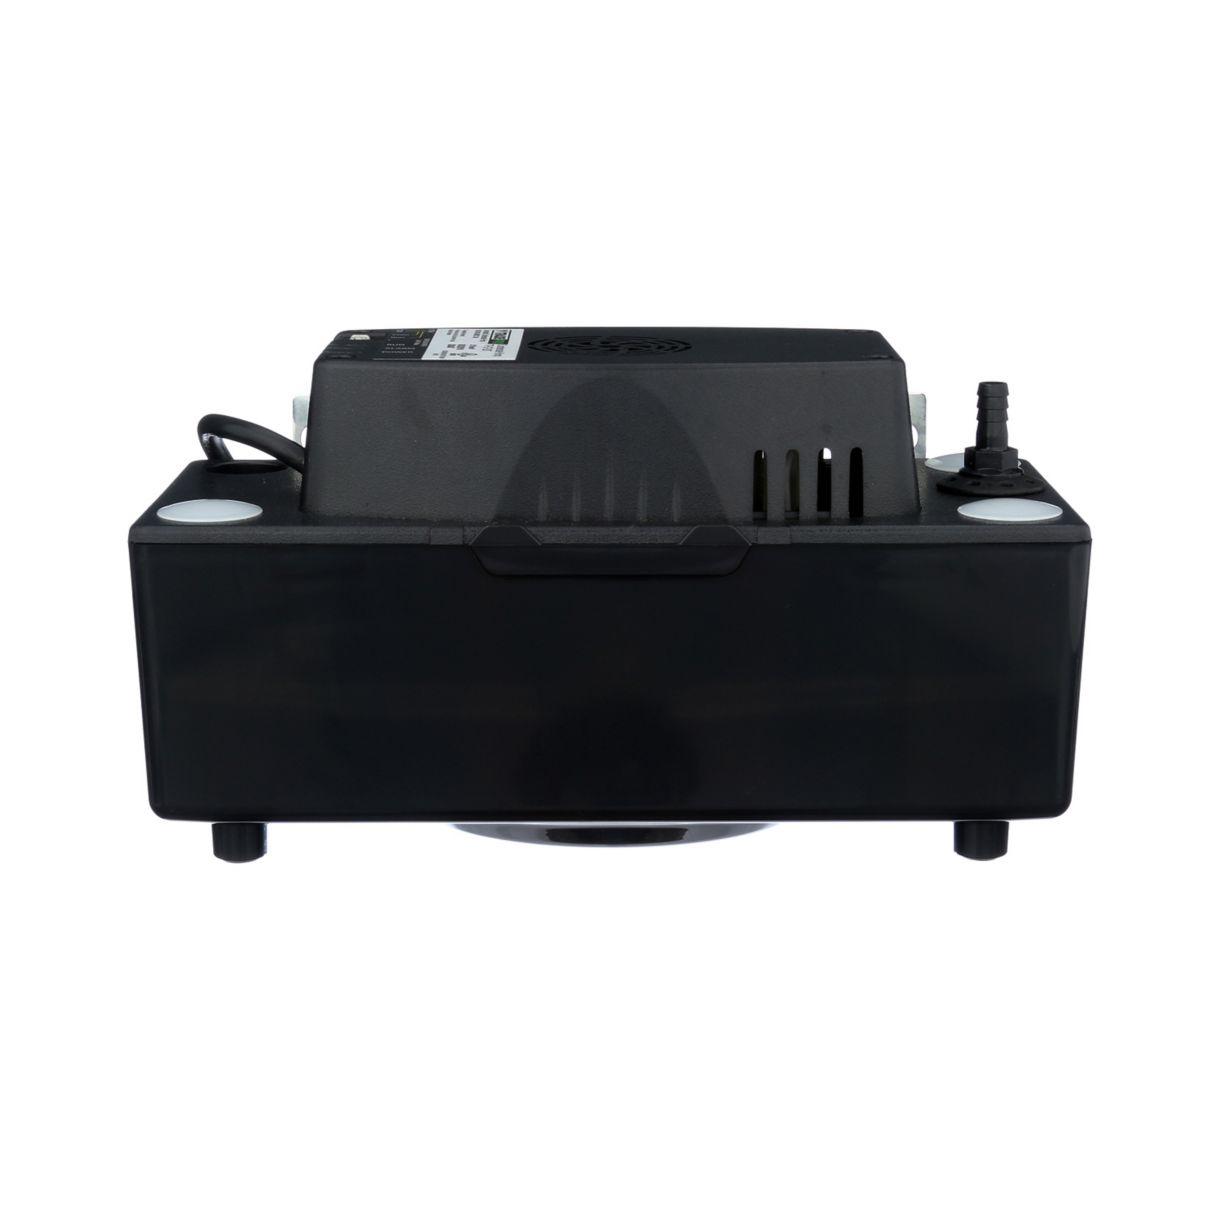 tradepro condensate pumps